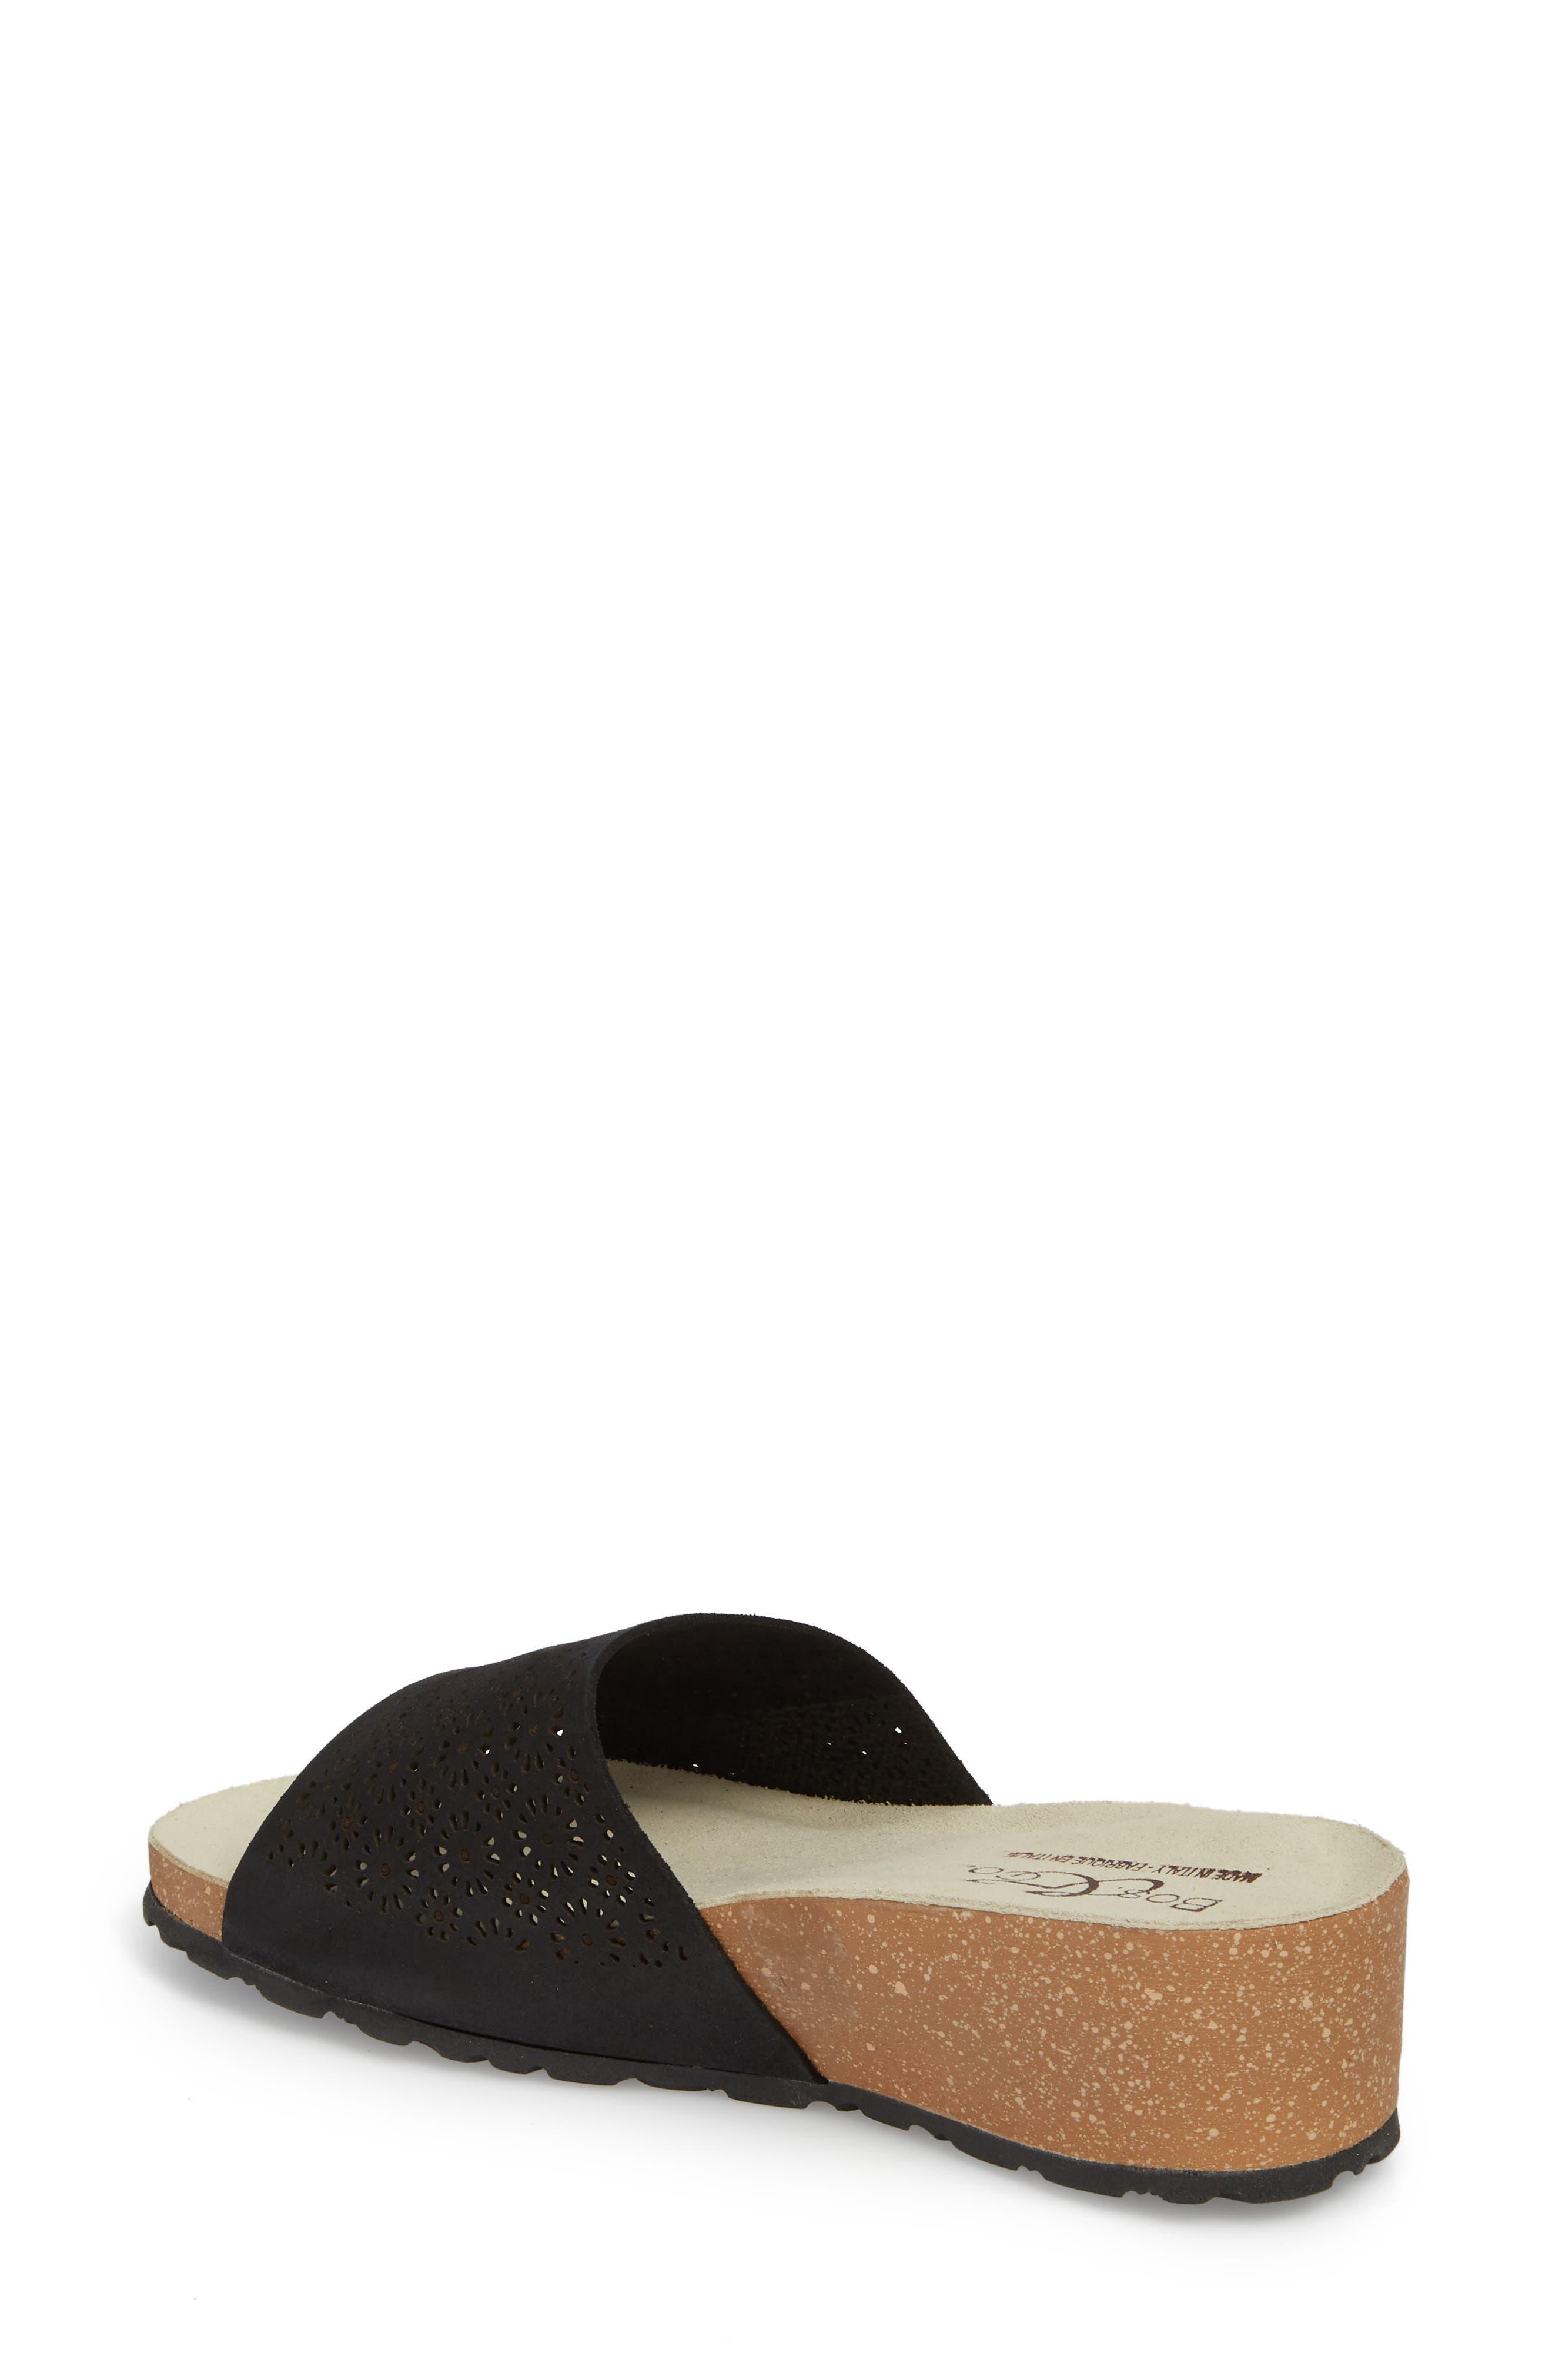 Loa Wedge Slide Sandal,                             Alternate thumbnail 2, color,                             BLACK SUEDE